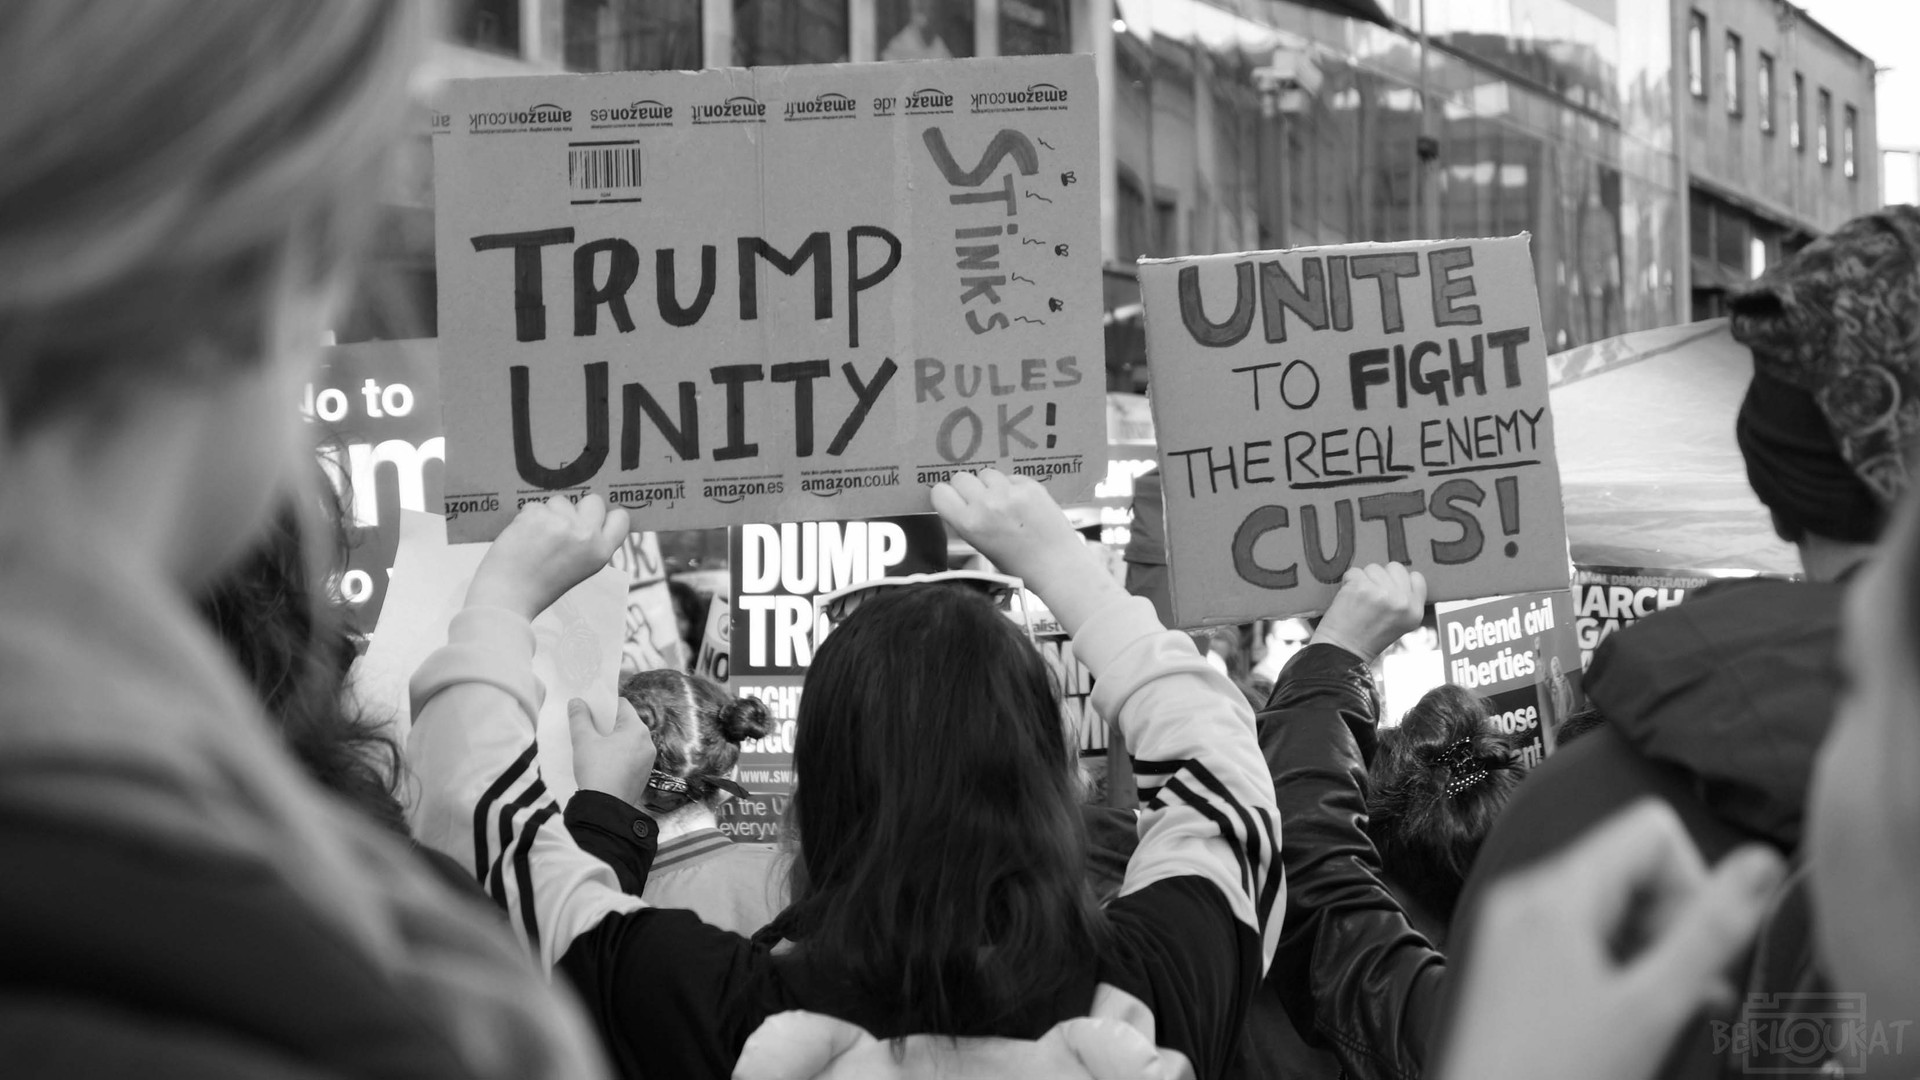 """Trump Stinks, Unity Rules OK!"""